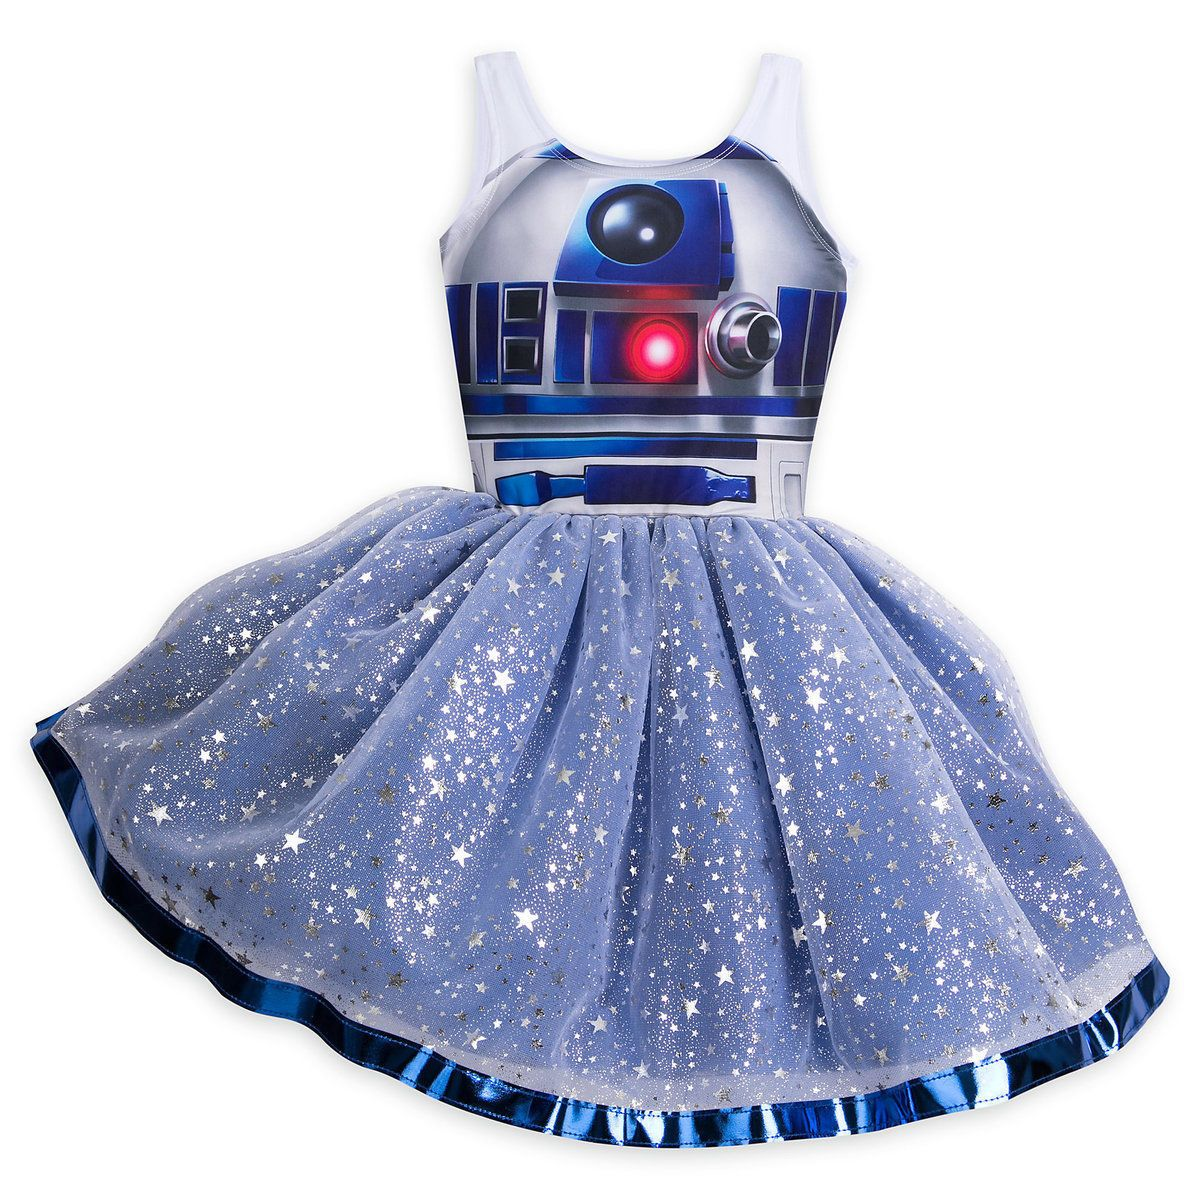 Disney authentic star wars rd tutu dress for tweens girls size